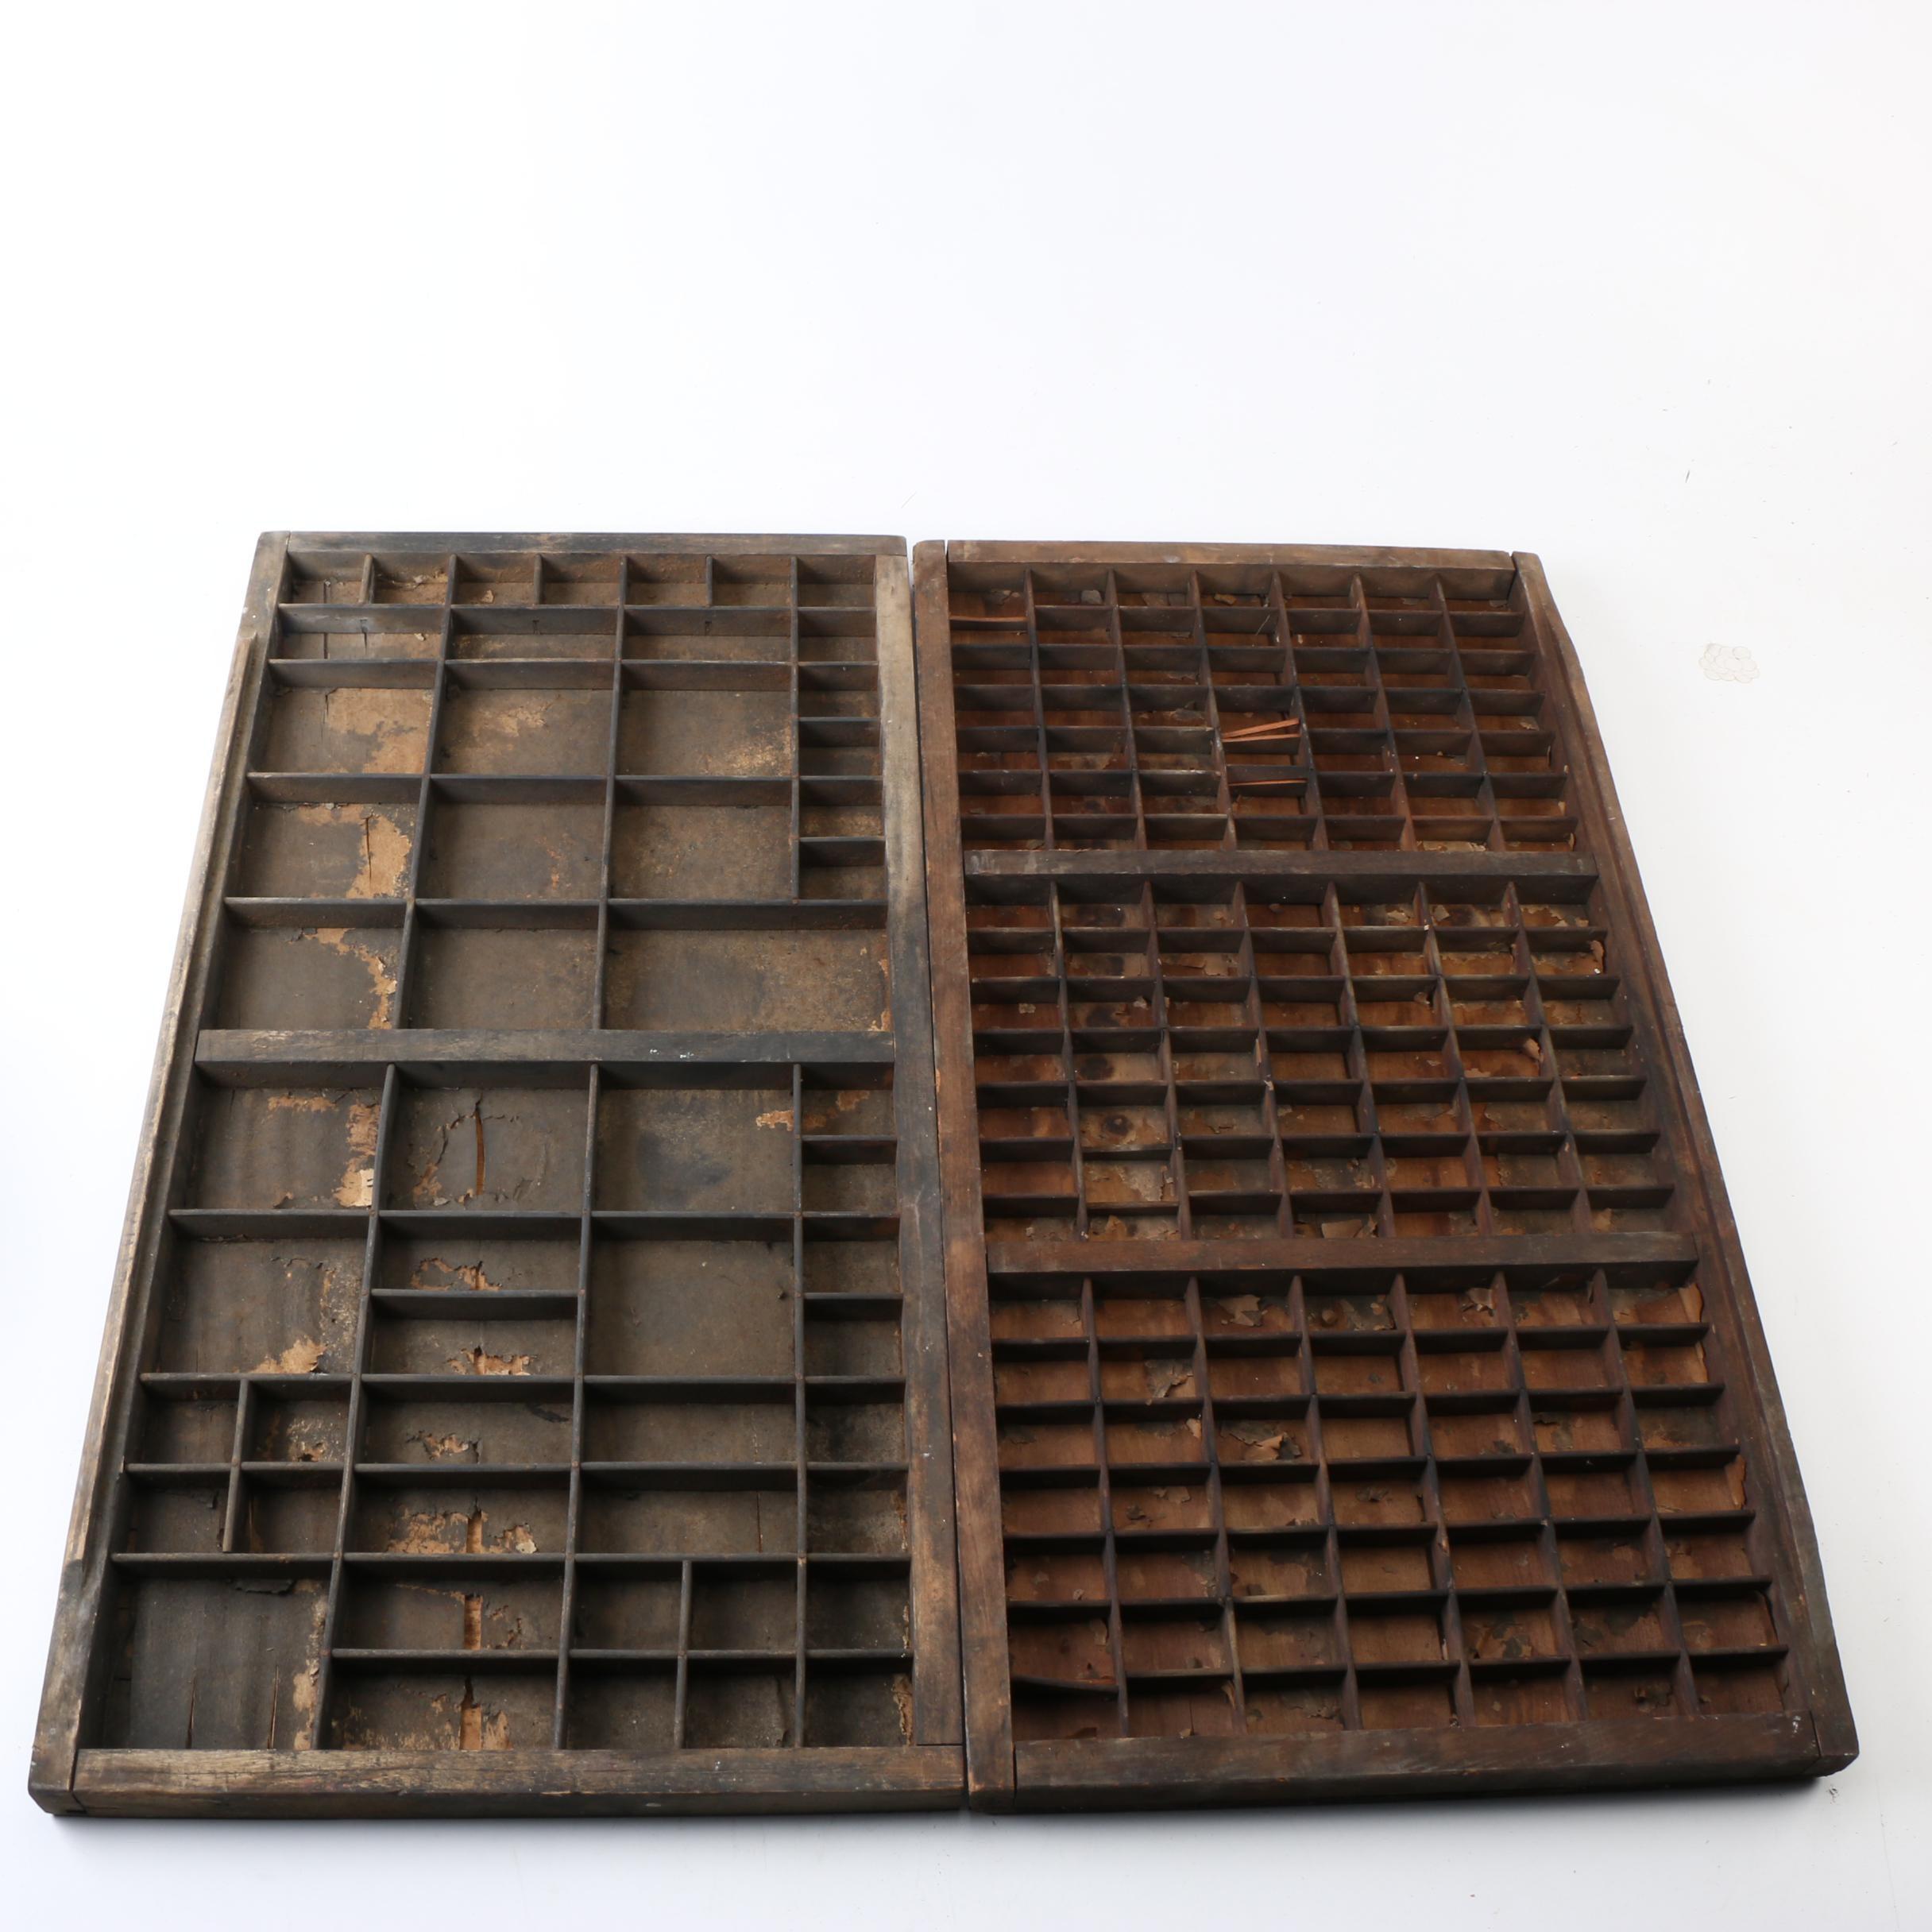 Vintage Printer's Typeset Trays